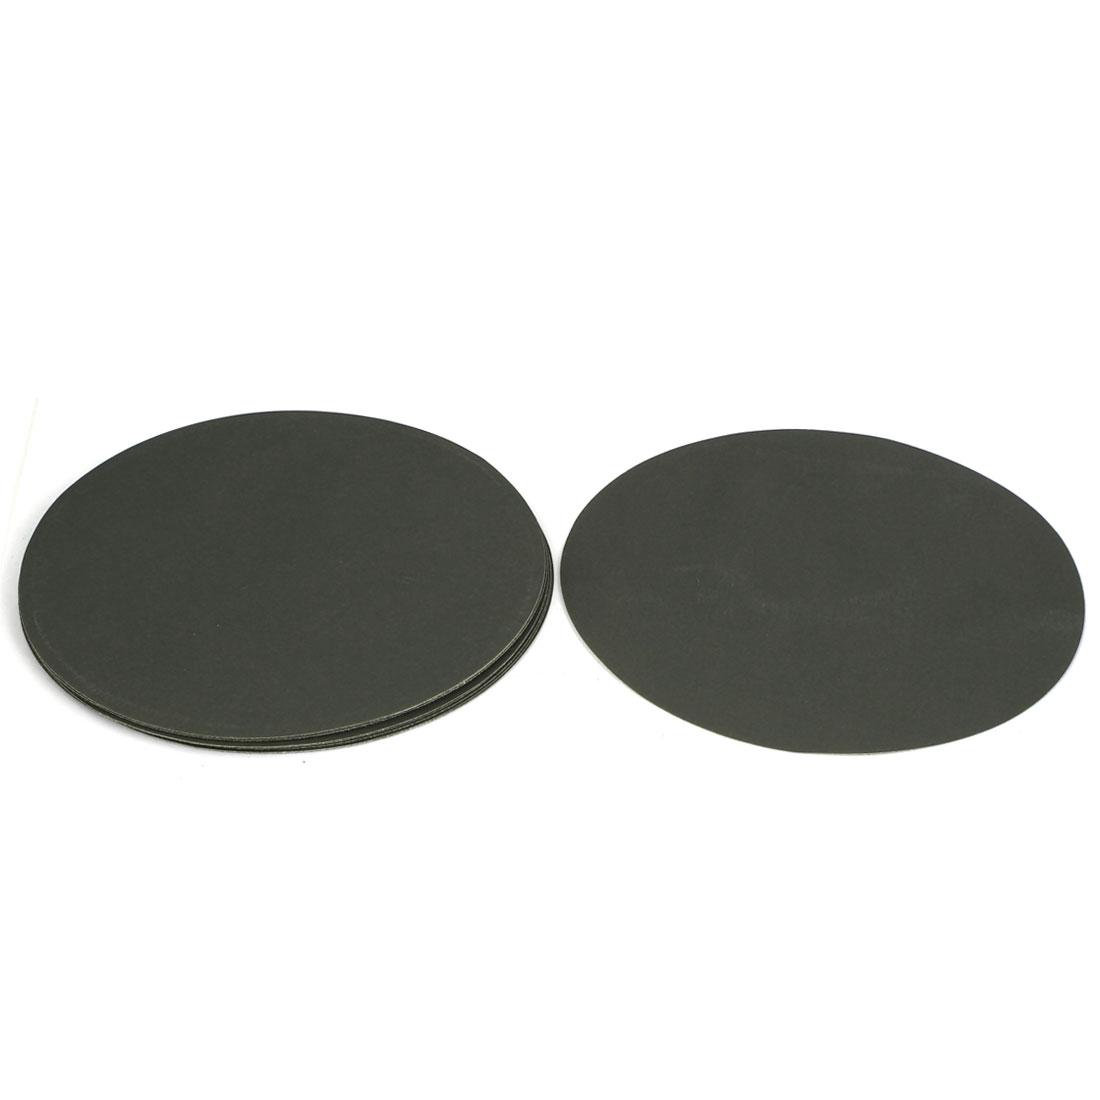 "8"" Dia Wet Dry Silicone Carbide 2000 Grit Polishing Sand Paper 10pcs"